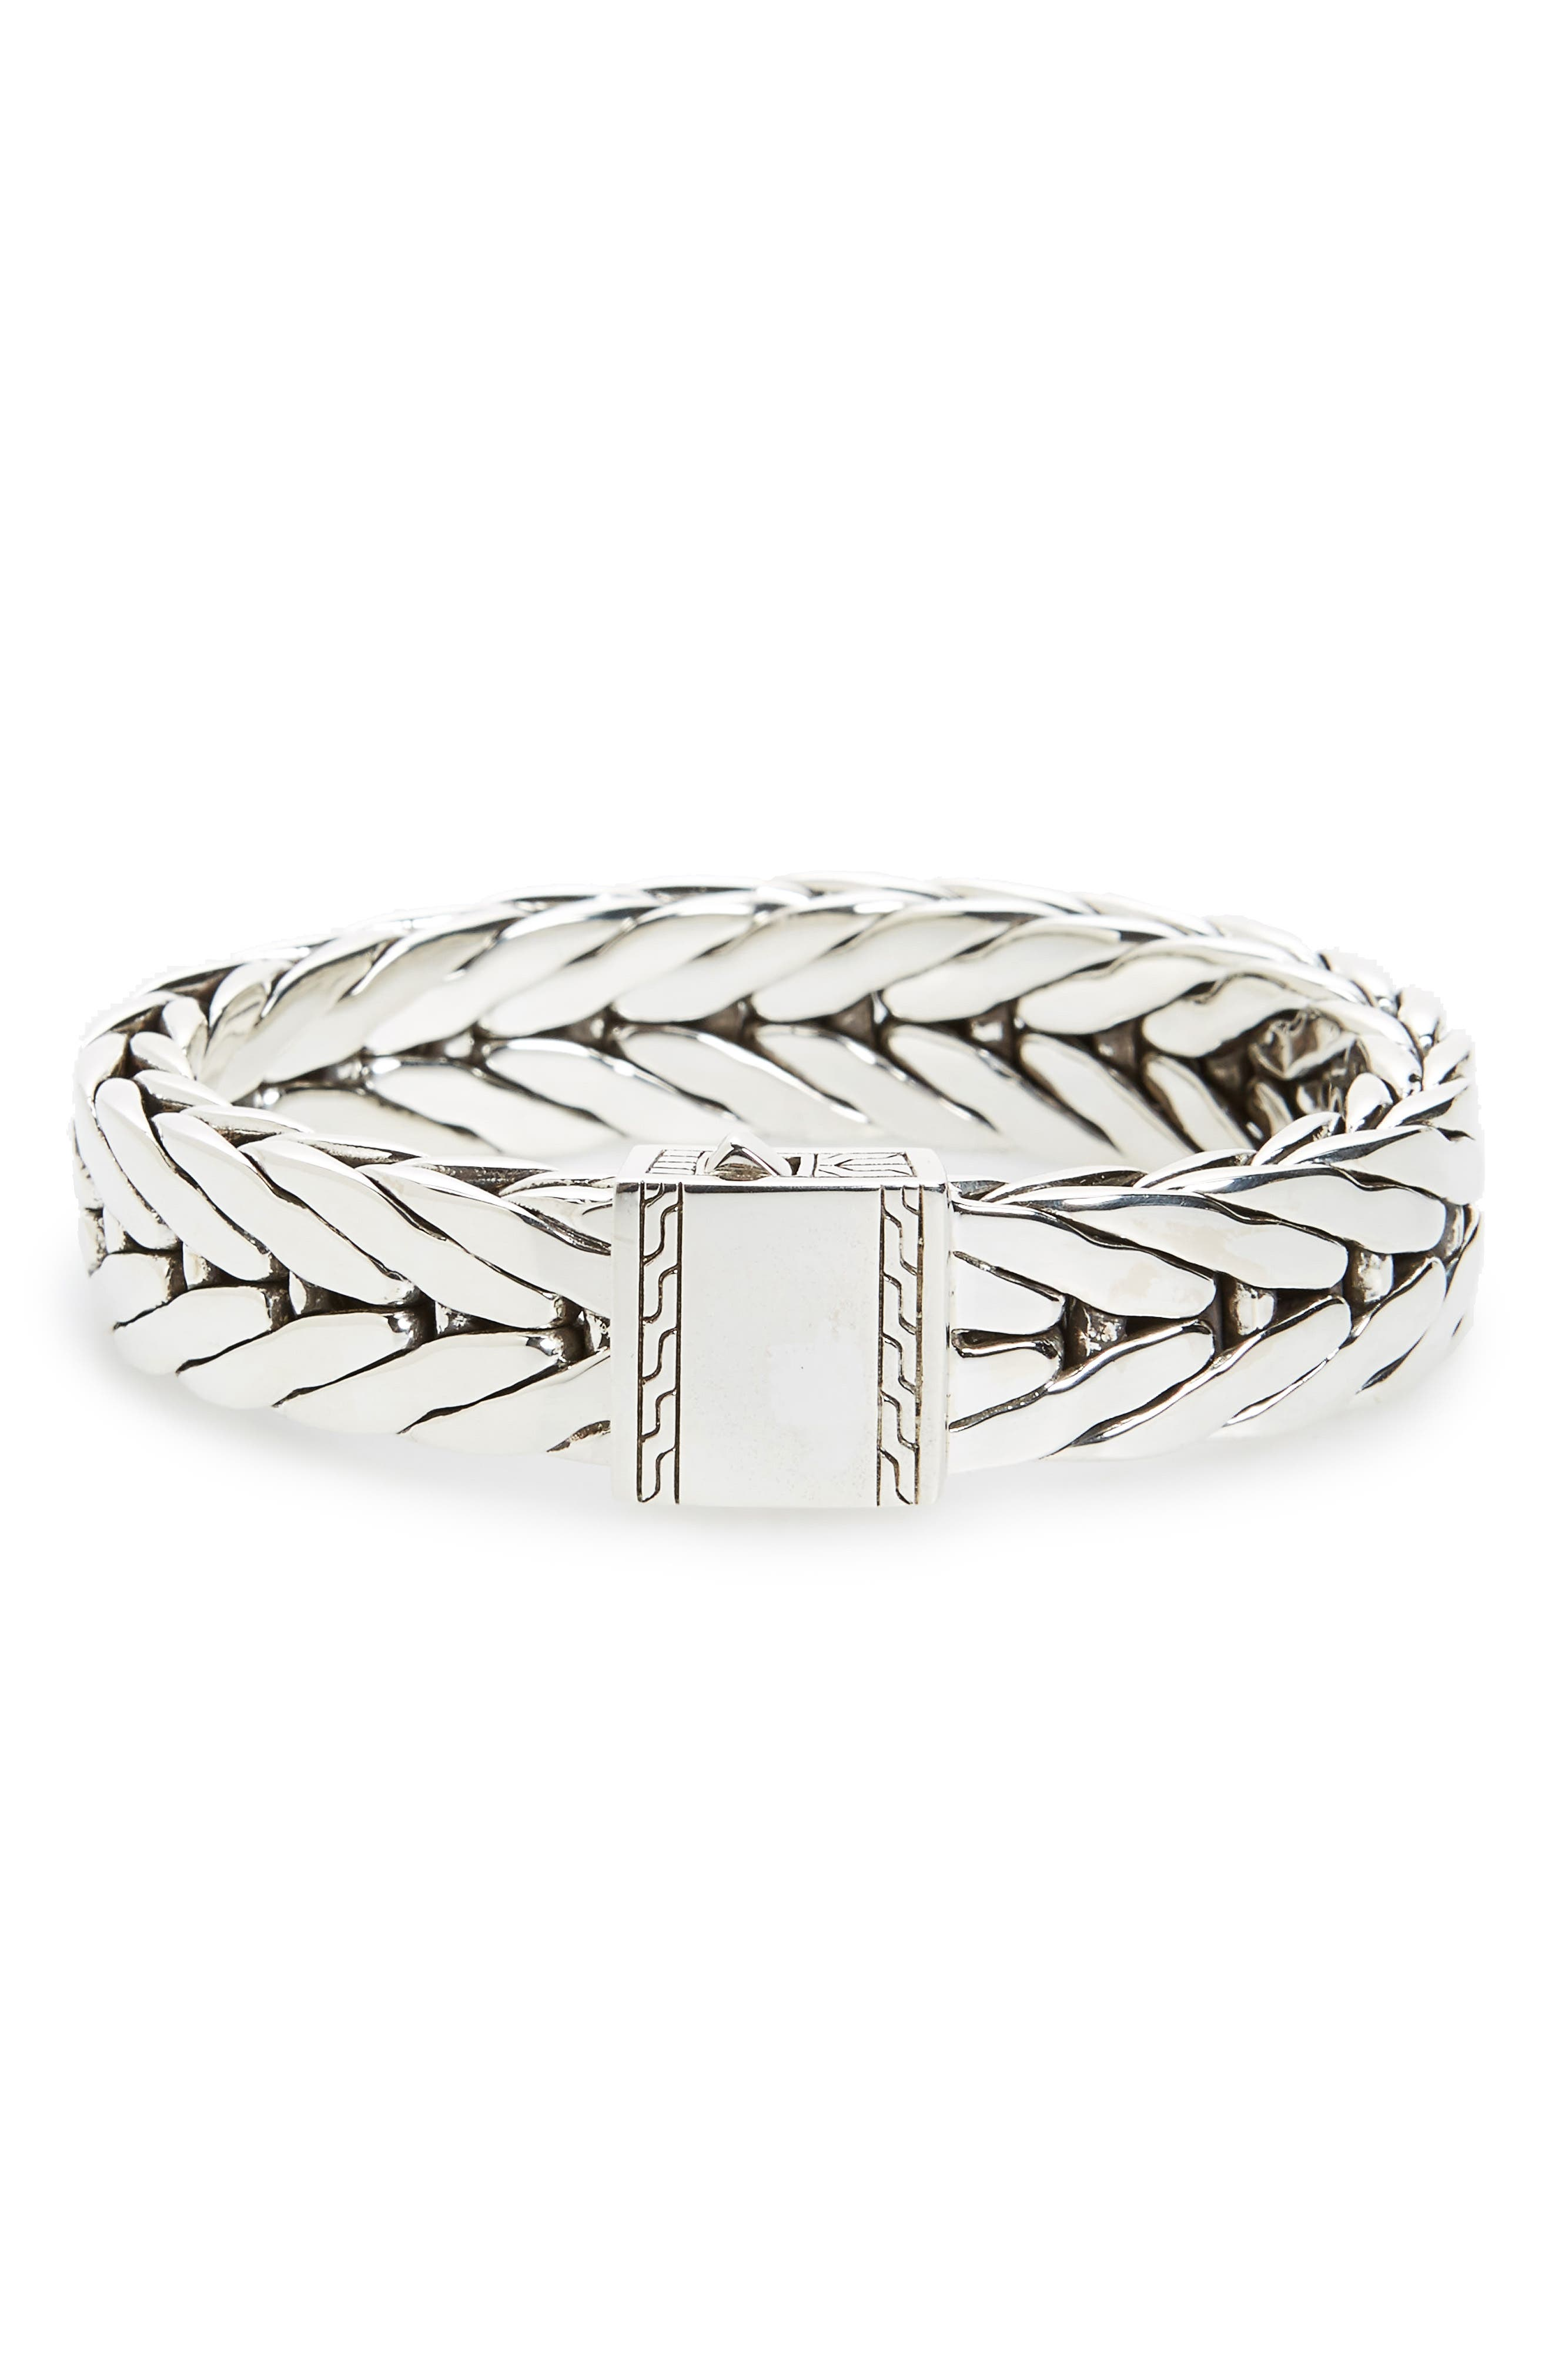 JOHN HARDY Modern Chain 16mm Bracelet